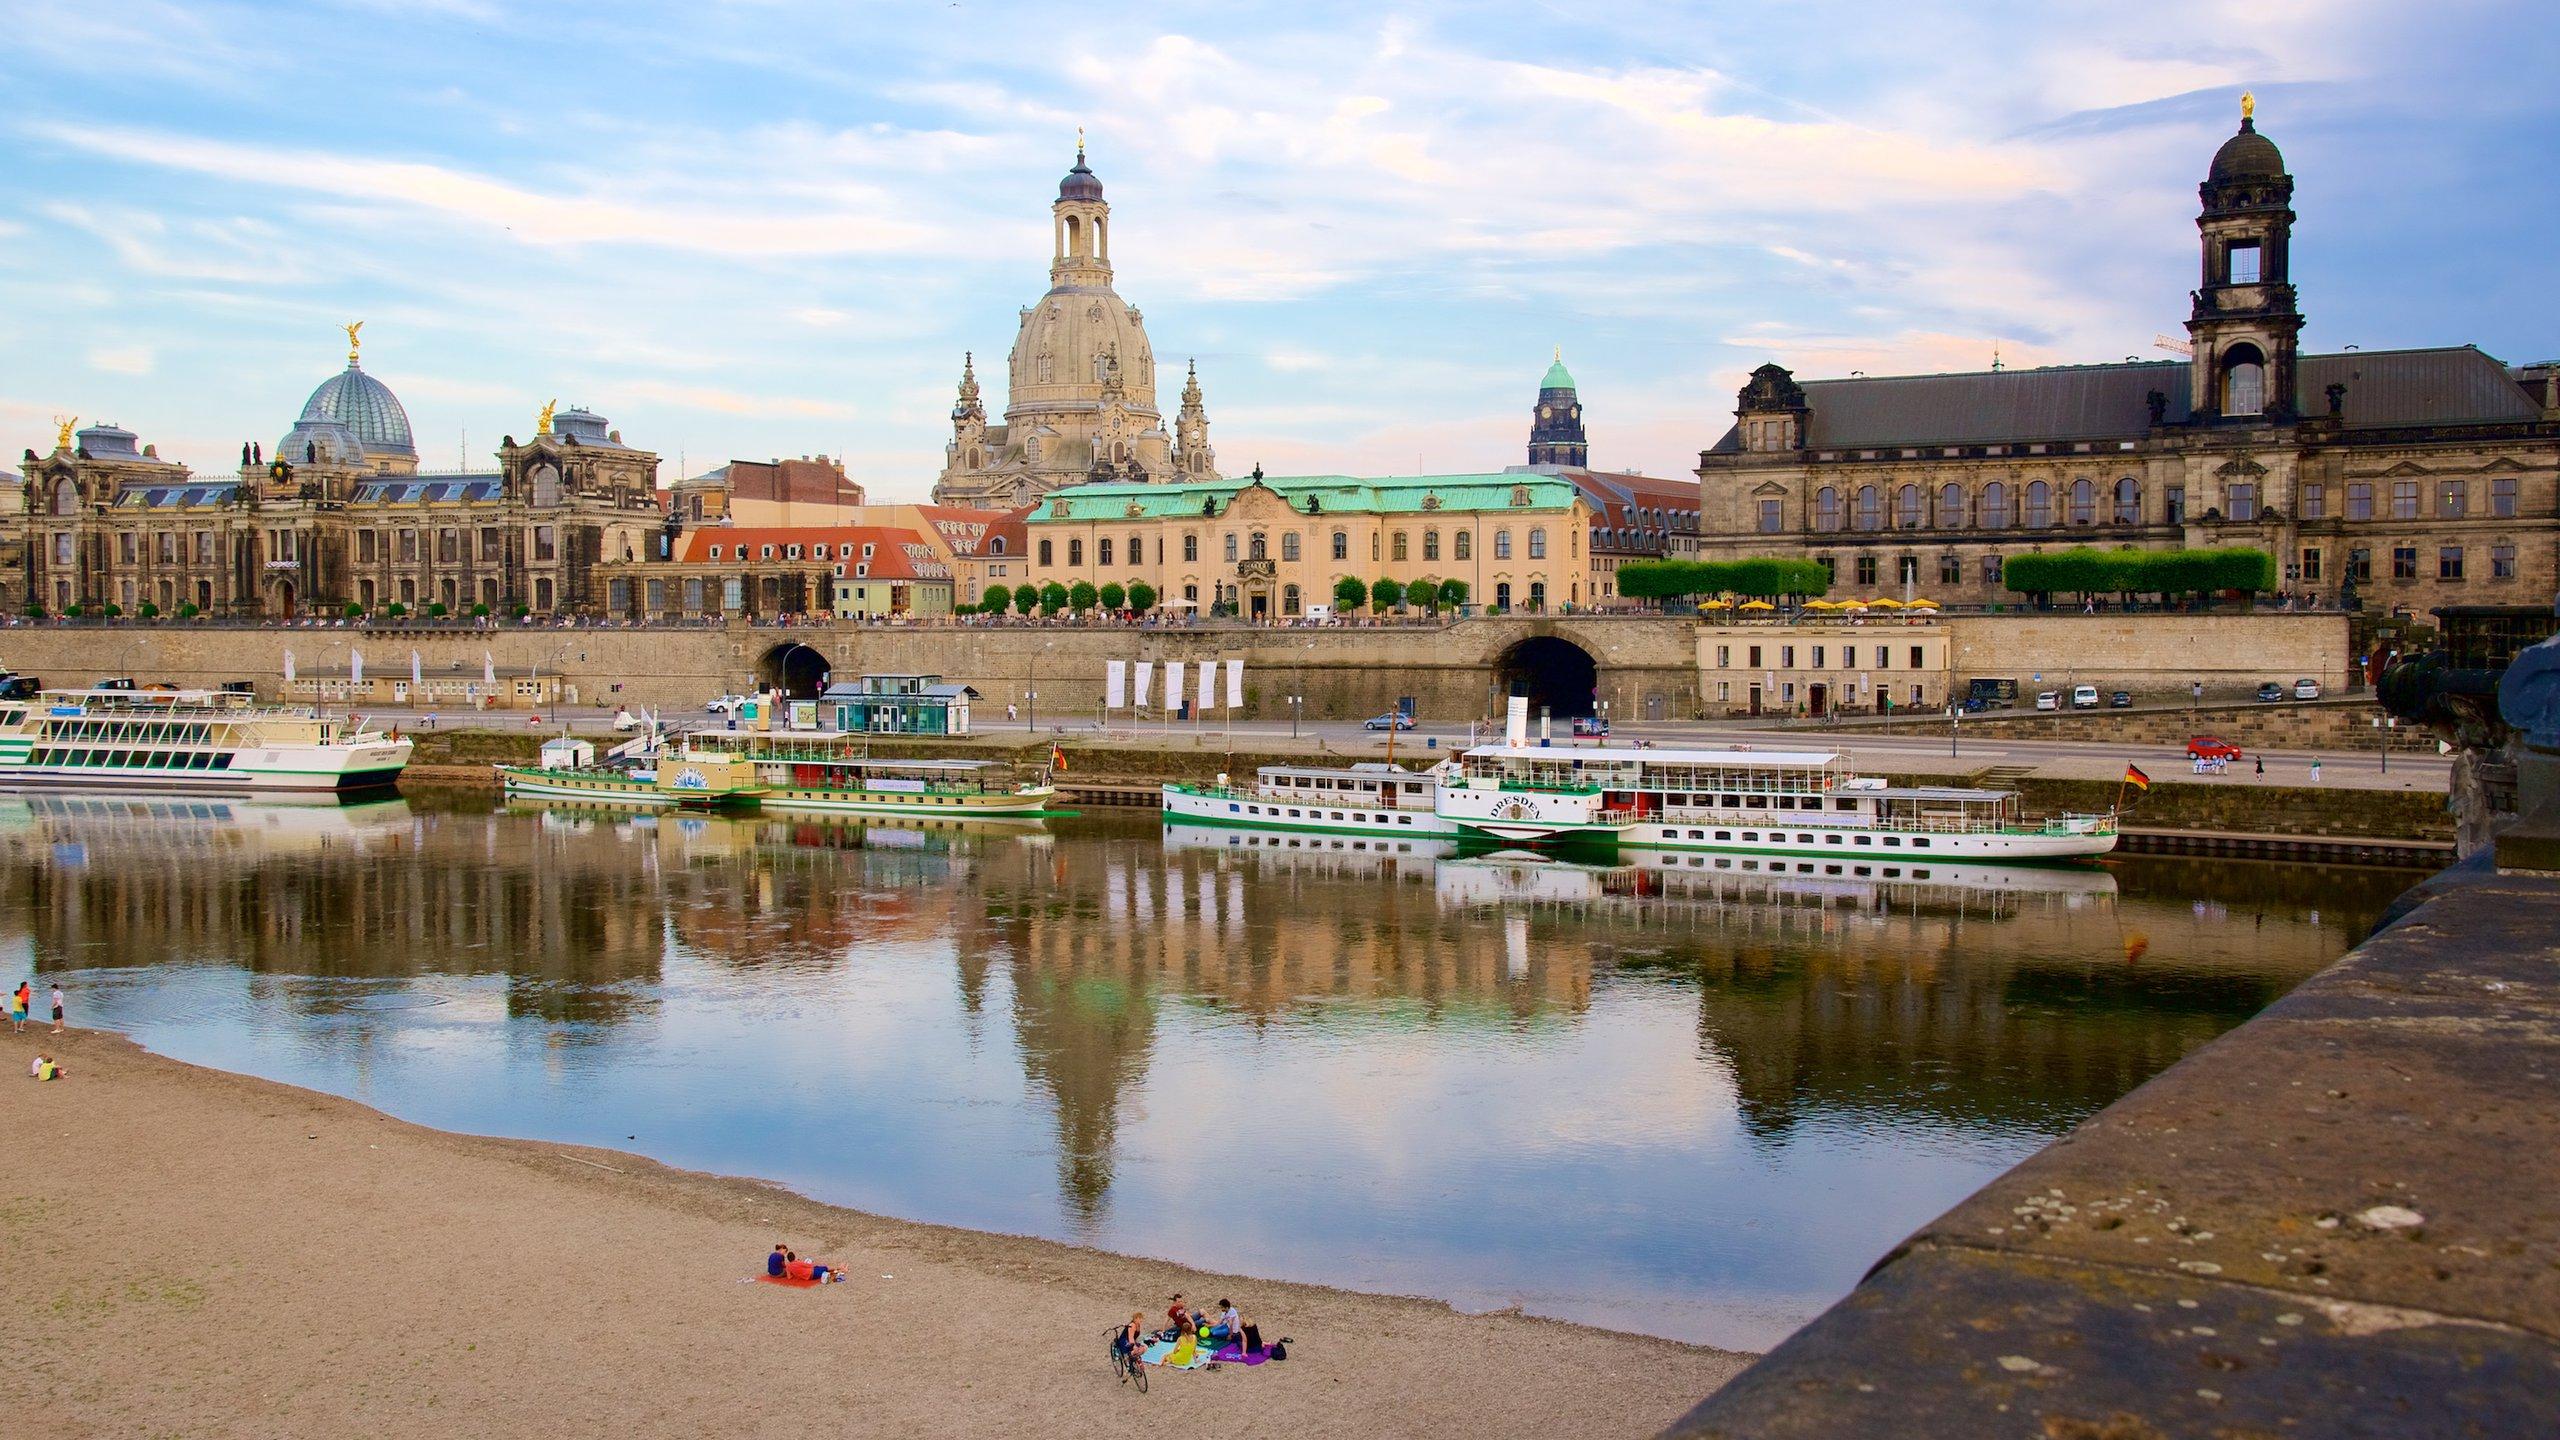 Innere Altstadt, Dresden, Saxony, Germany